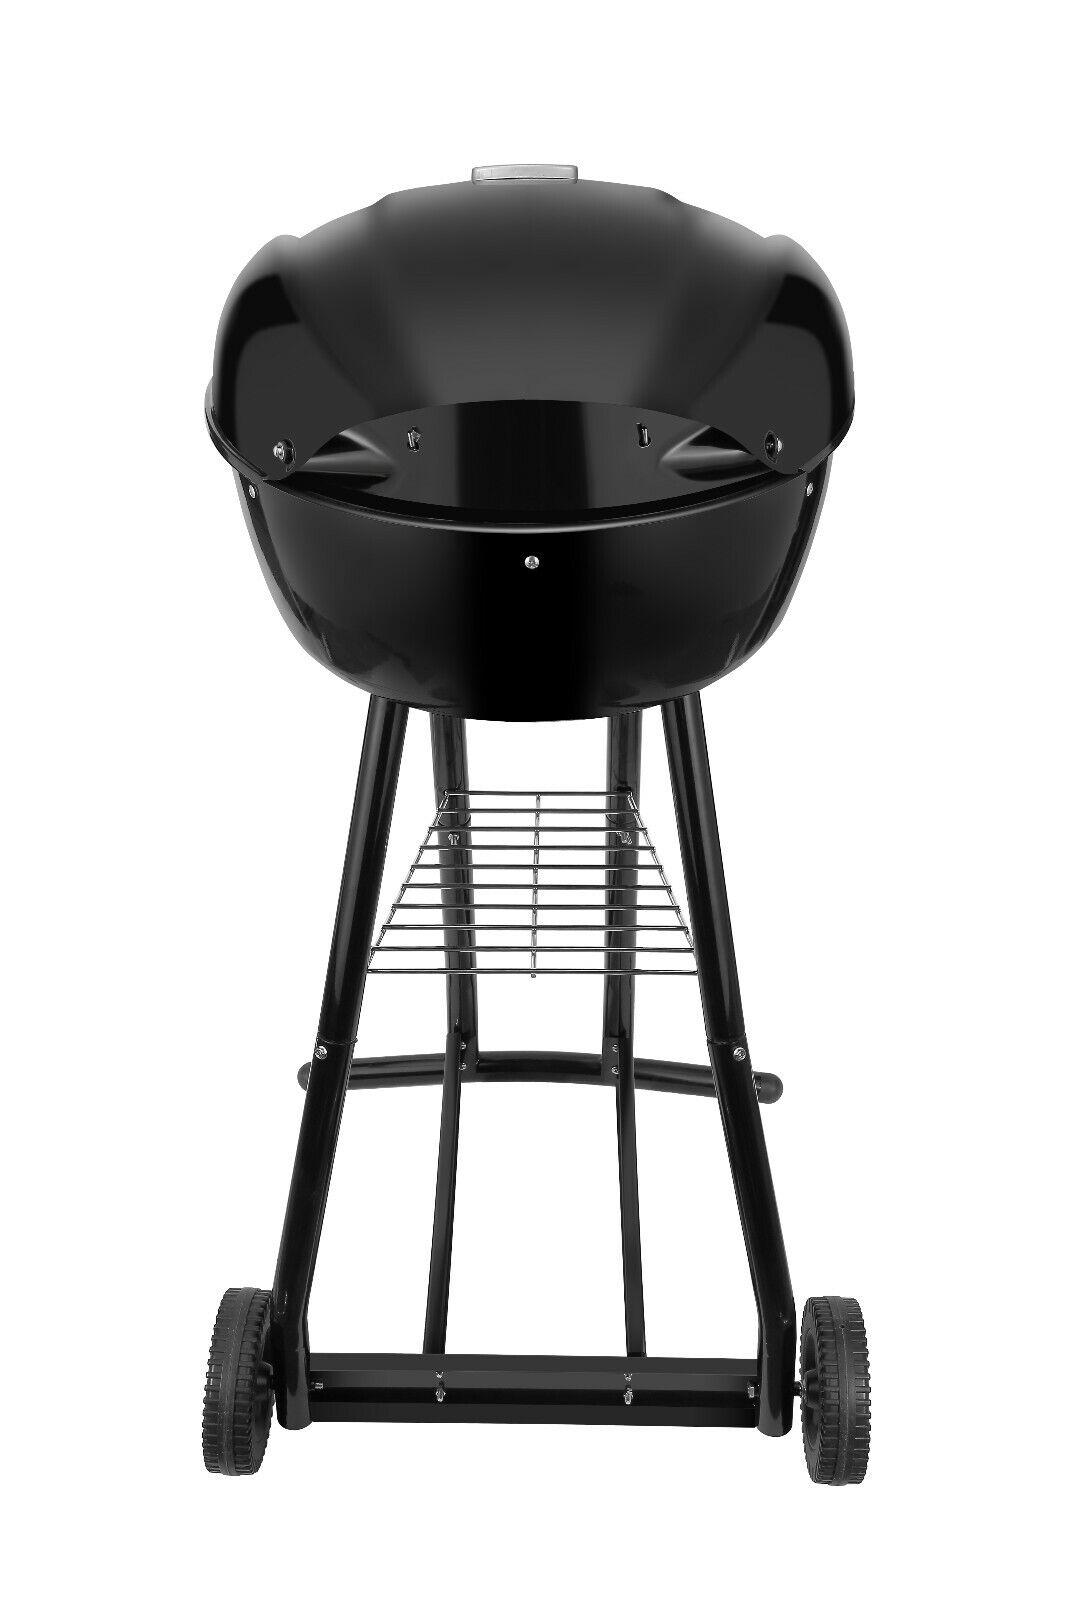 Kugel grill BBQ Holzkohlegrill Montenegro Activa Grillfläche 50cm B Ware